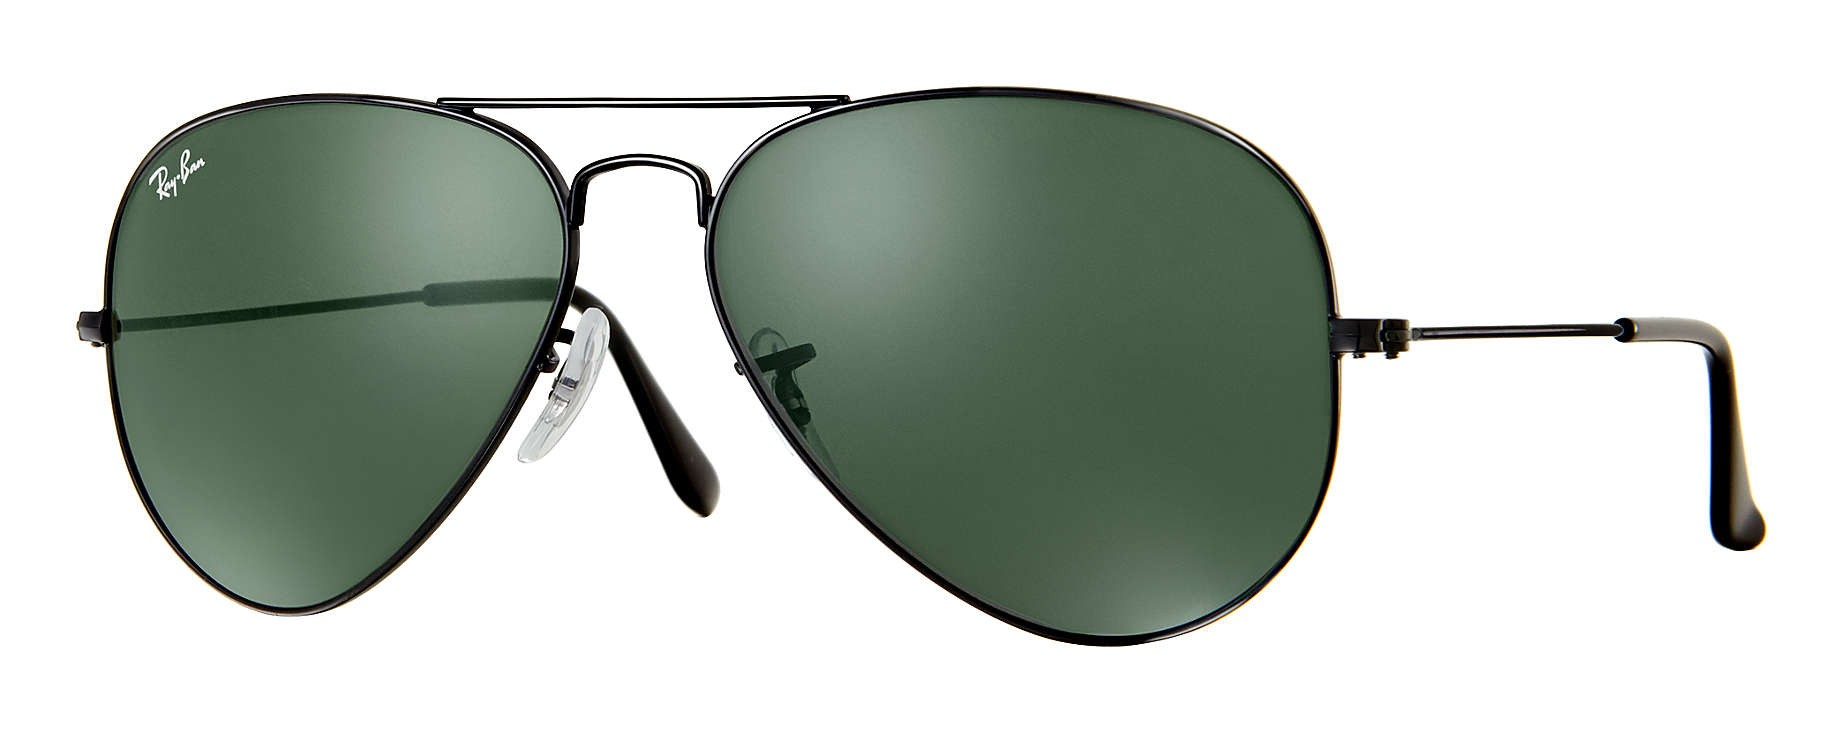 4683f318c8 Ray-Ban - RB3025 L2823 - Original Aviator Classic - Gunmetal - Green  Classic G-15 Lenses - Sunglass - Ray-Ban Eyewear - Avvenice